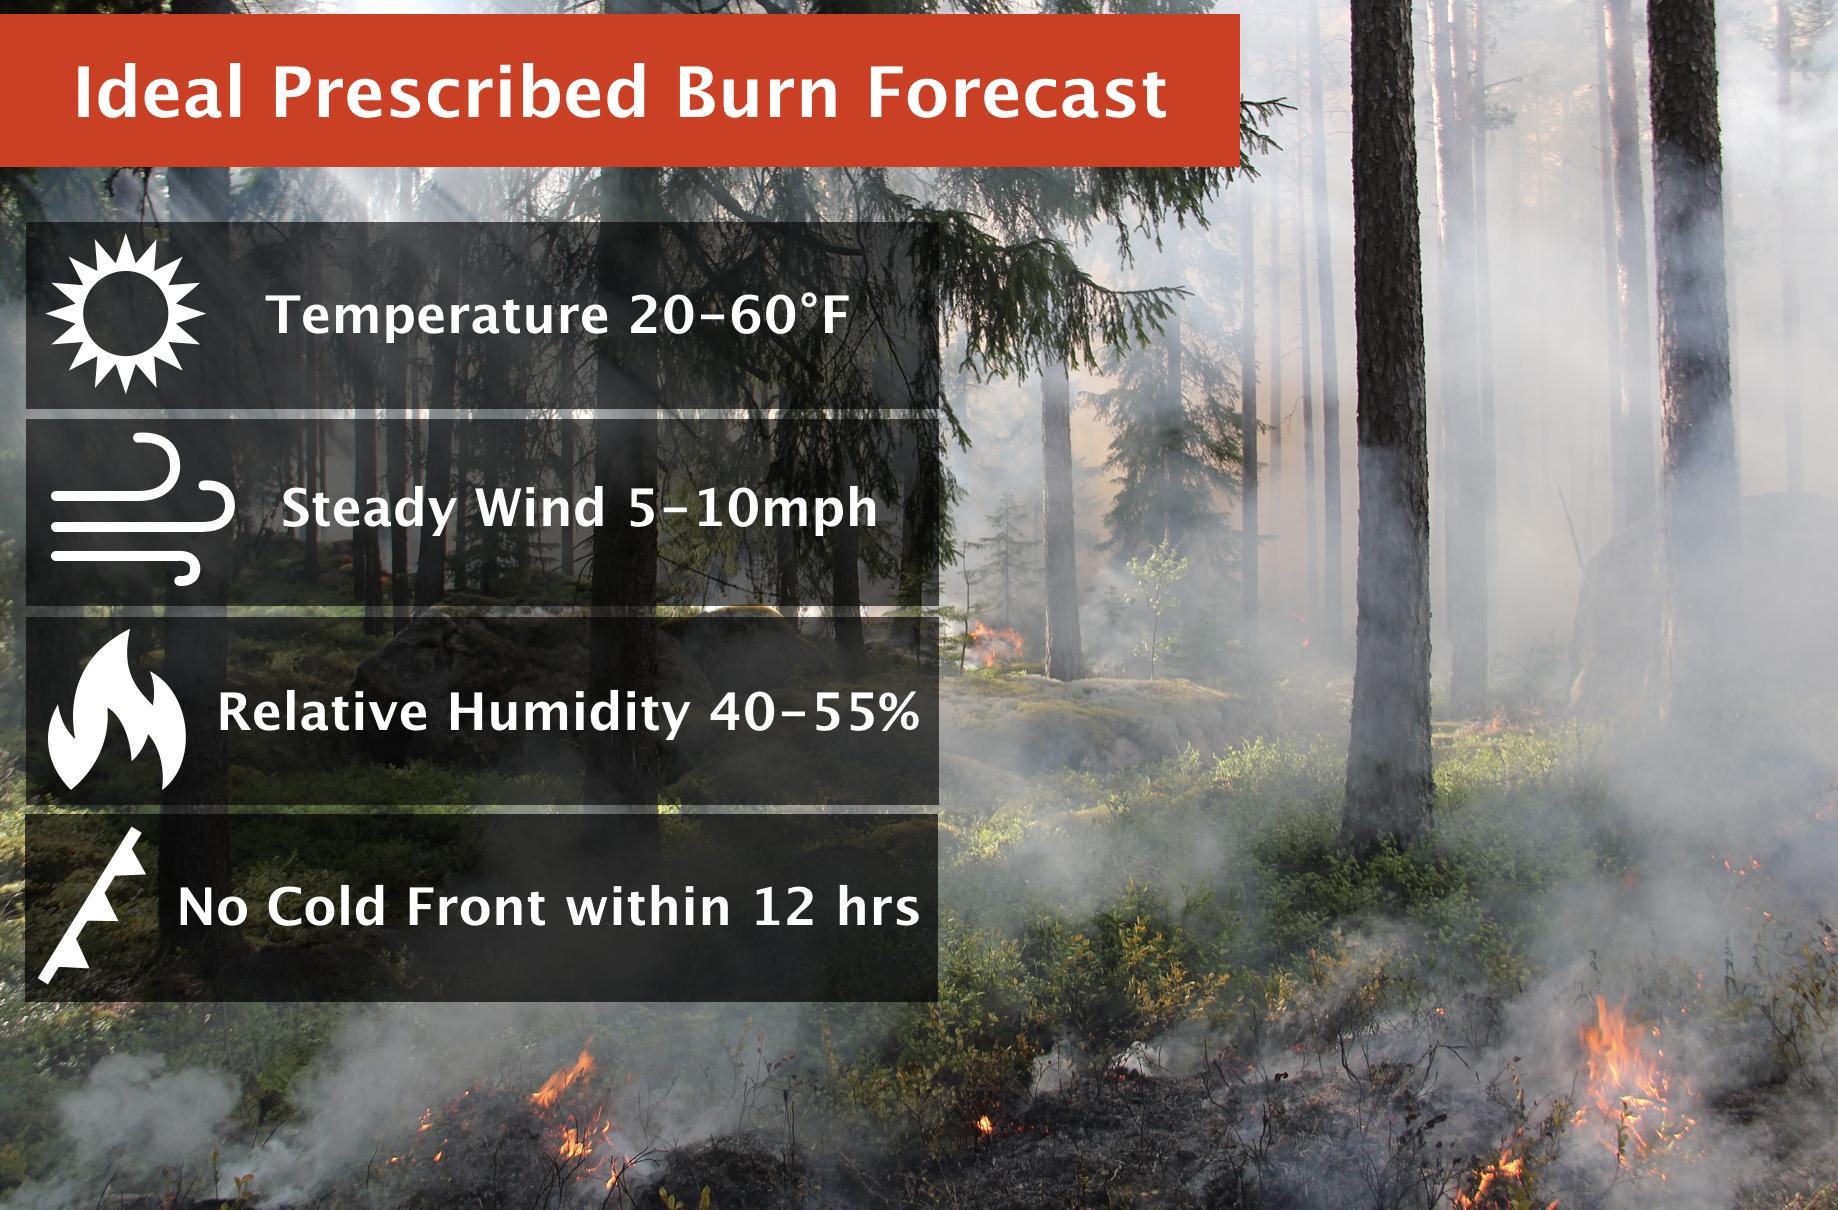 Ideal Prescribed Burn Forecast Conditions